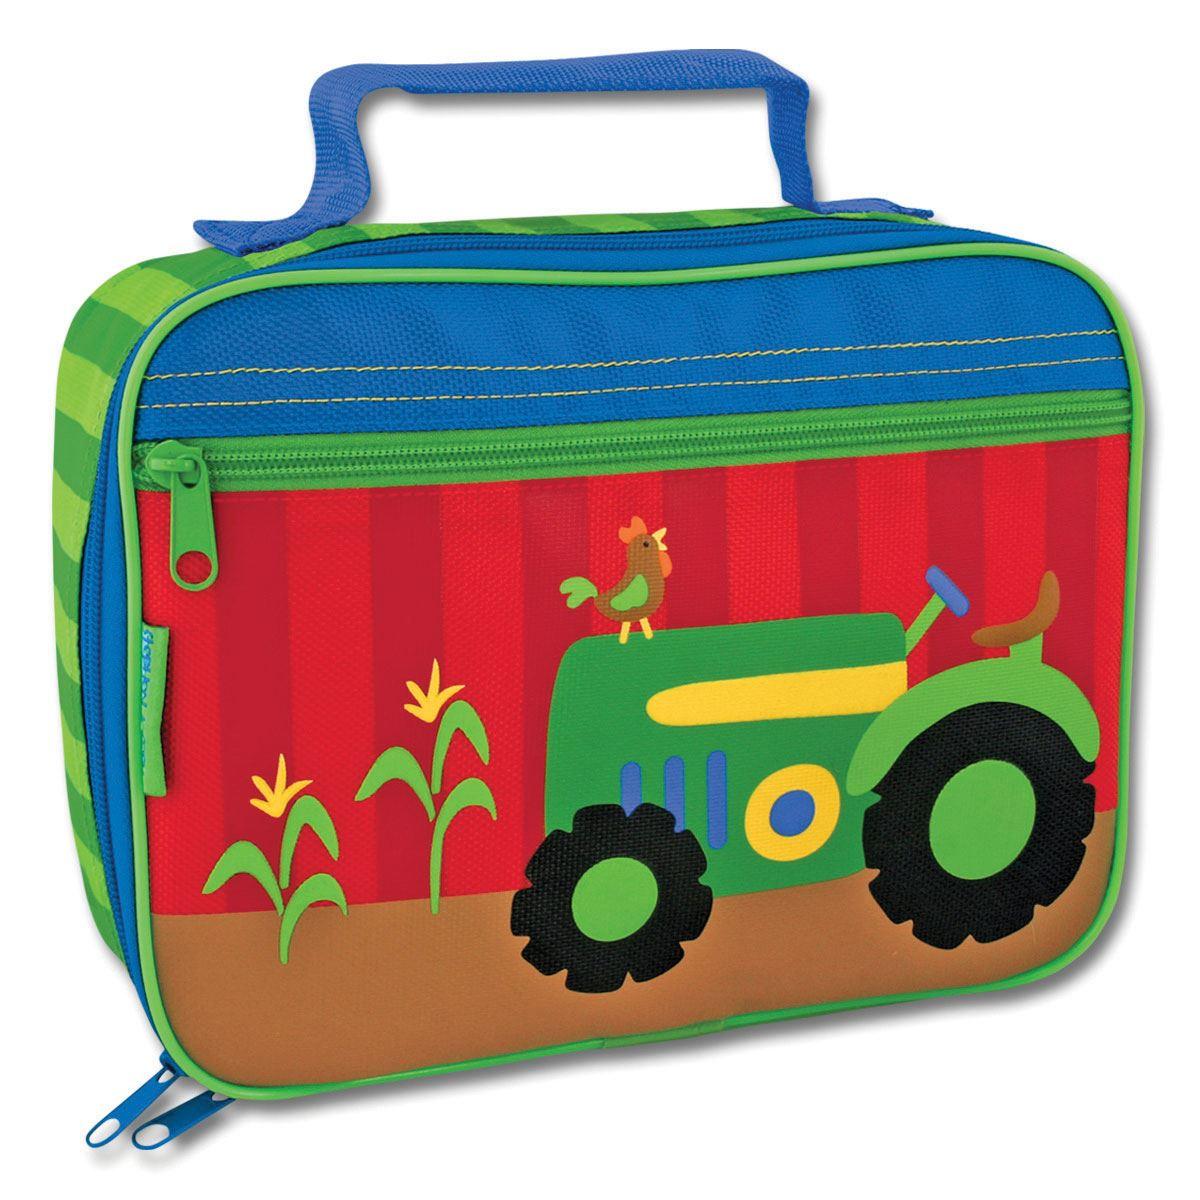 stephen joseph children kids portable insulated lunch. Black Bedroom Furniture Sets. Home Design Ideas